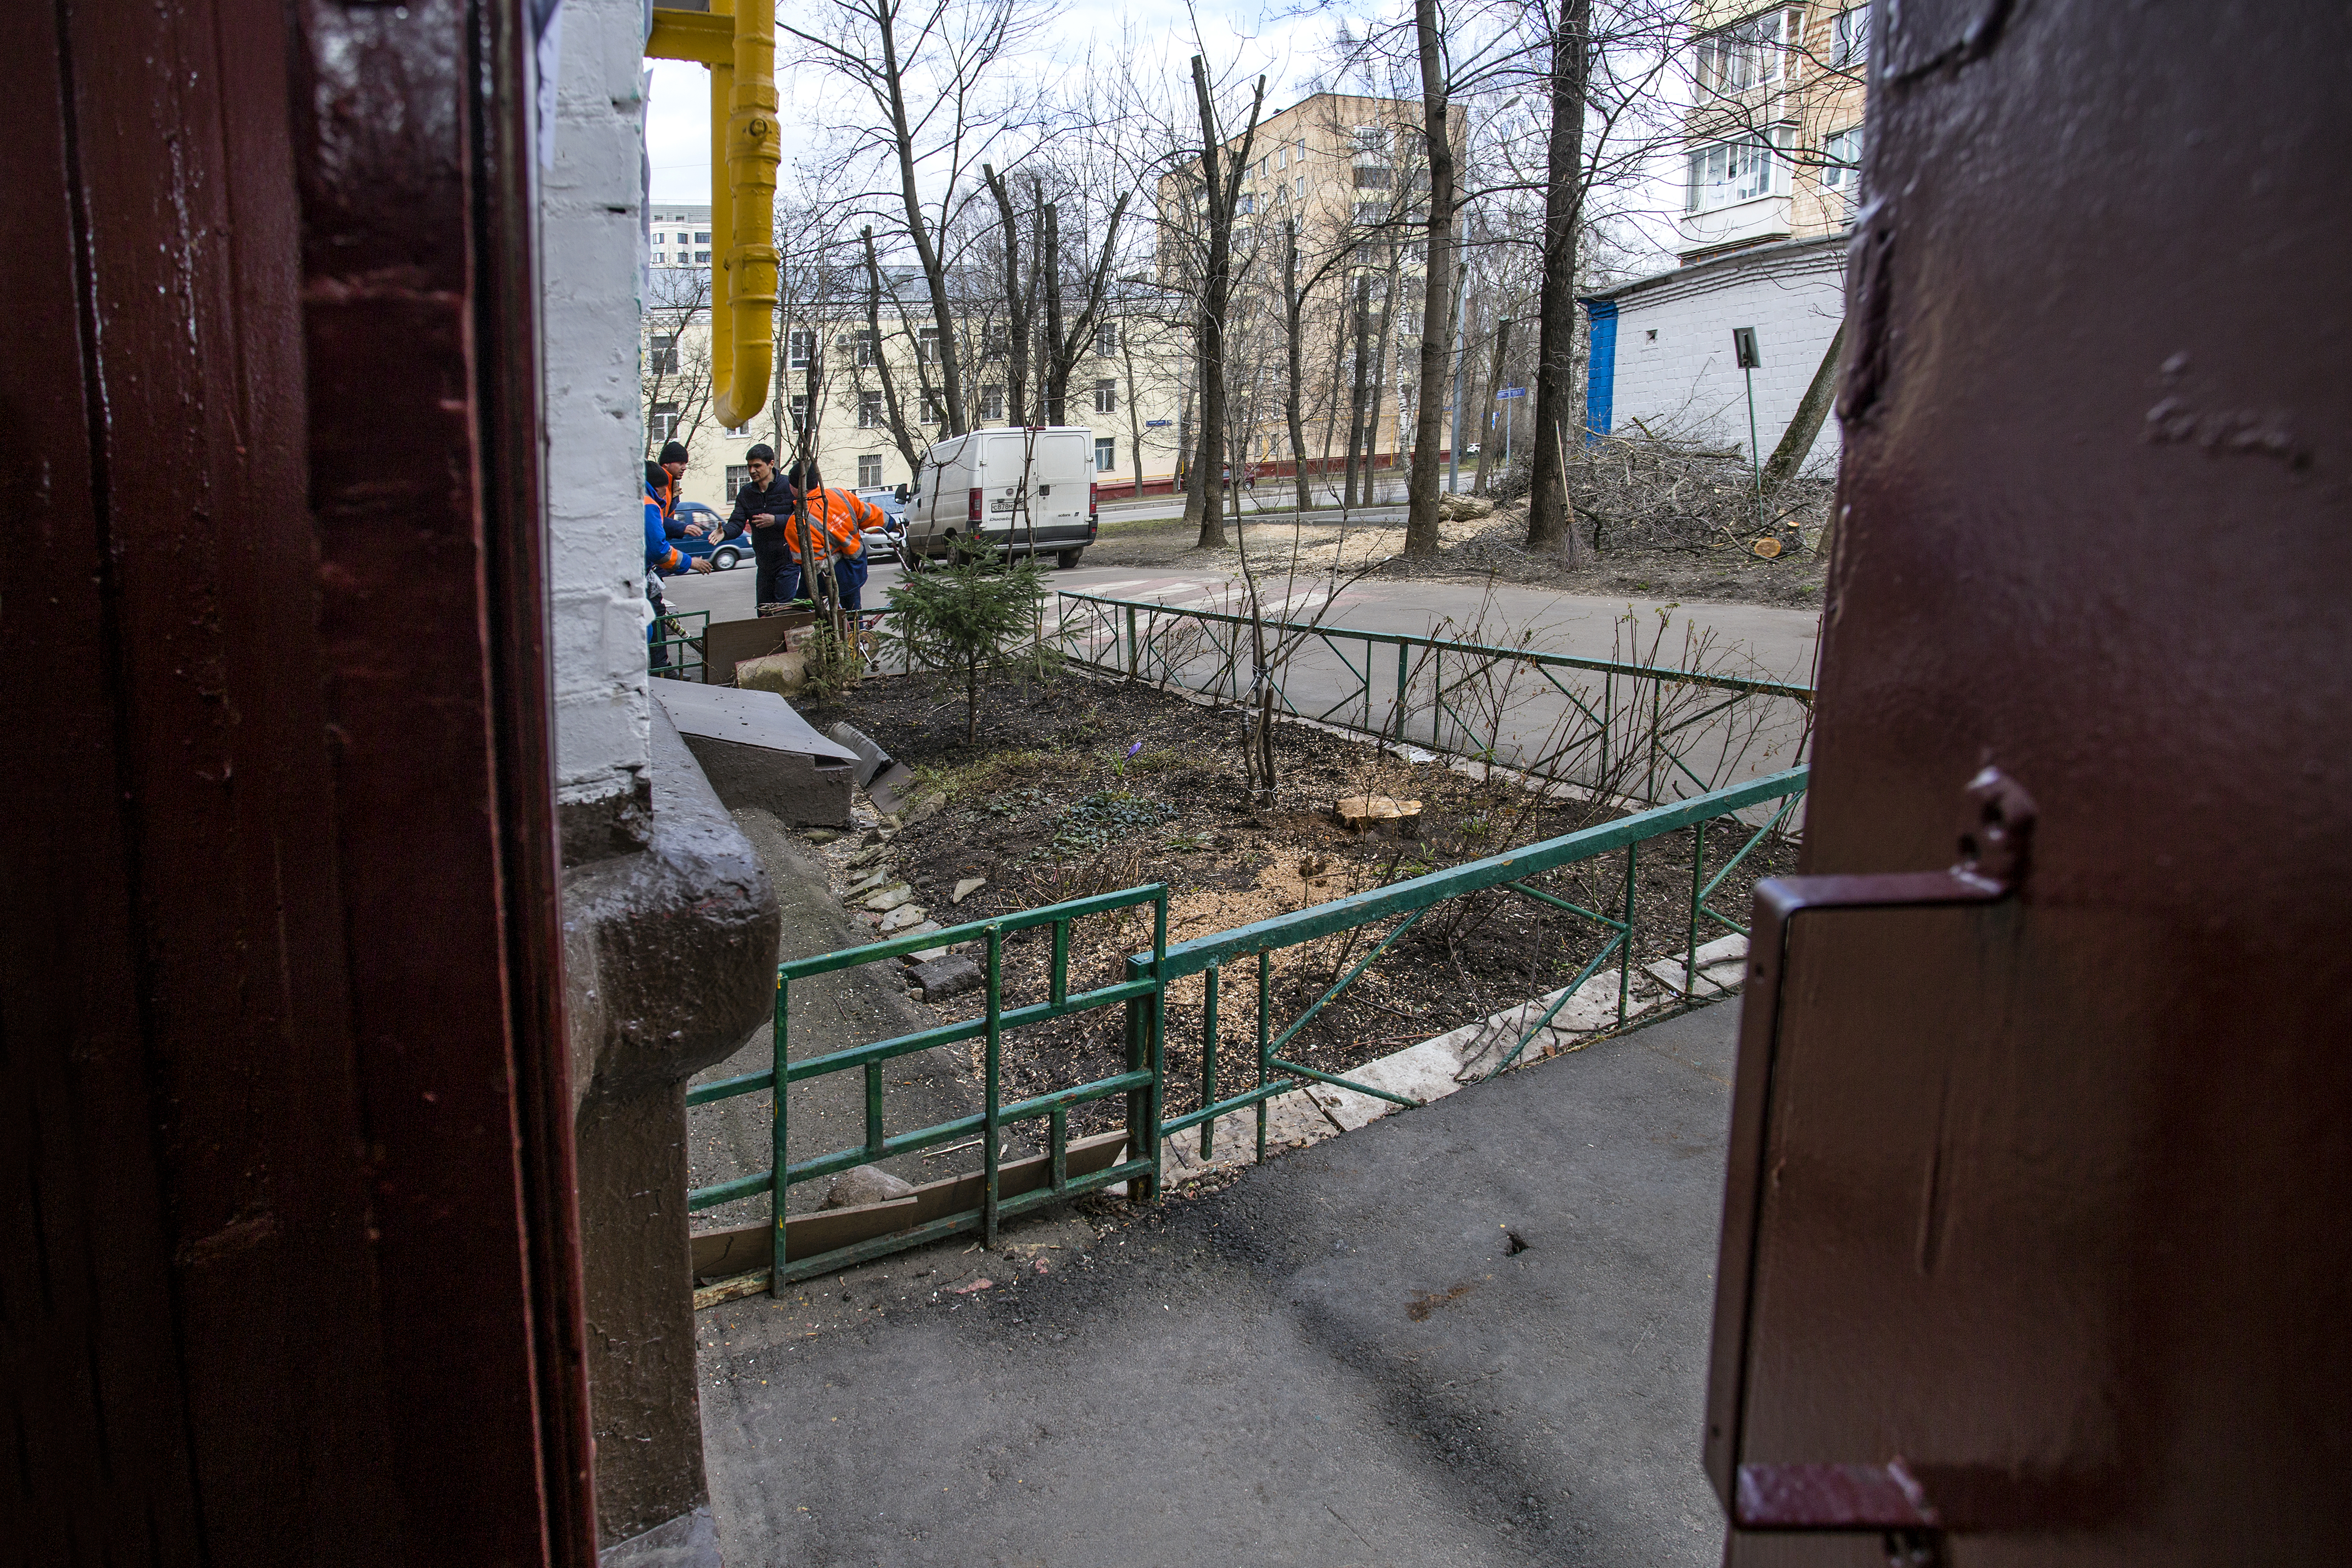 Journal de la quarantaine, 20 mars 2020, Jour 2 © Kseniya Yablonskaya